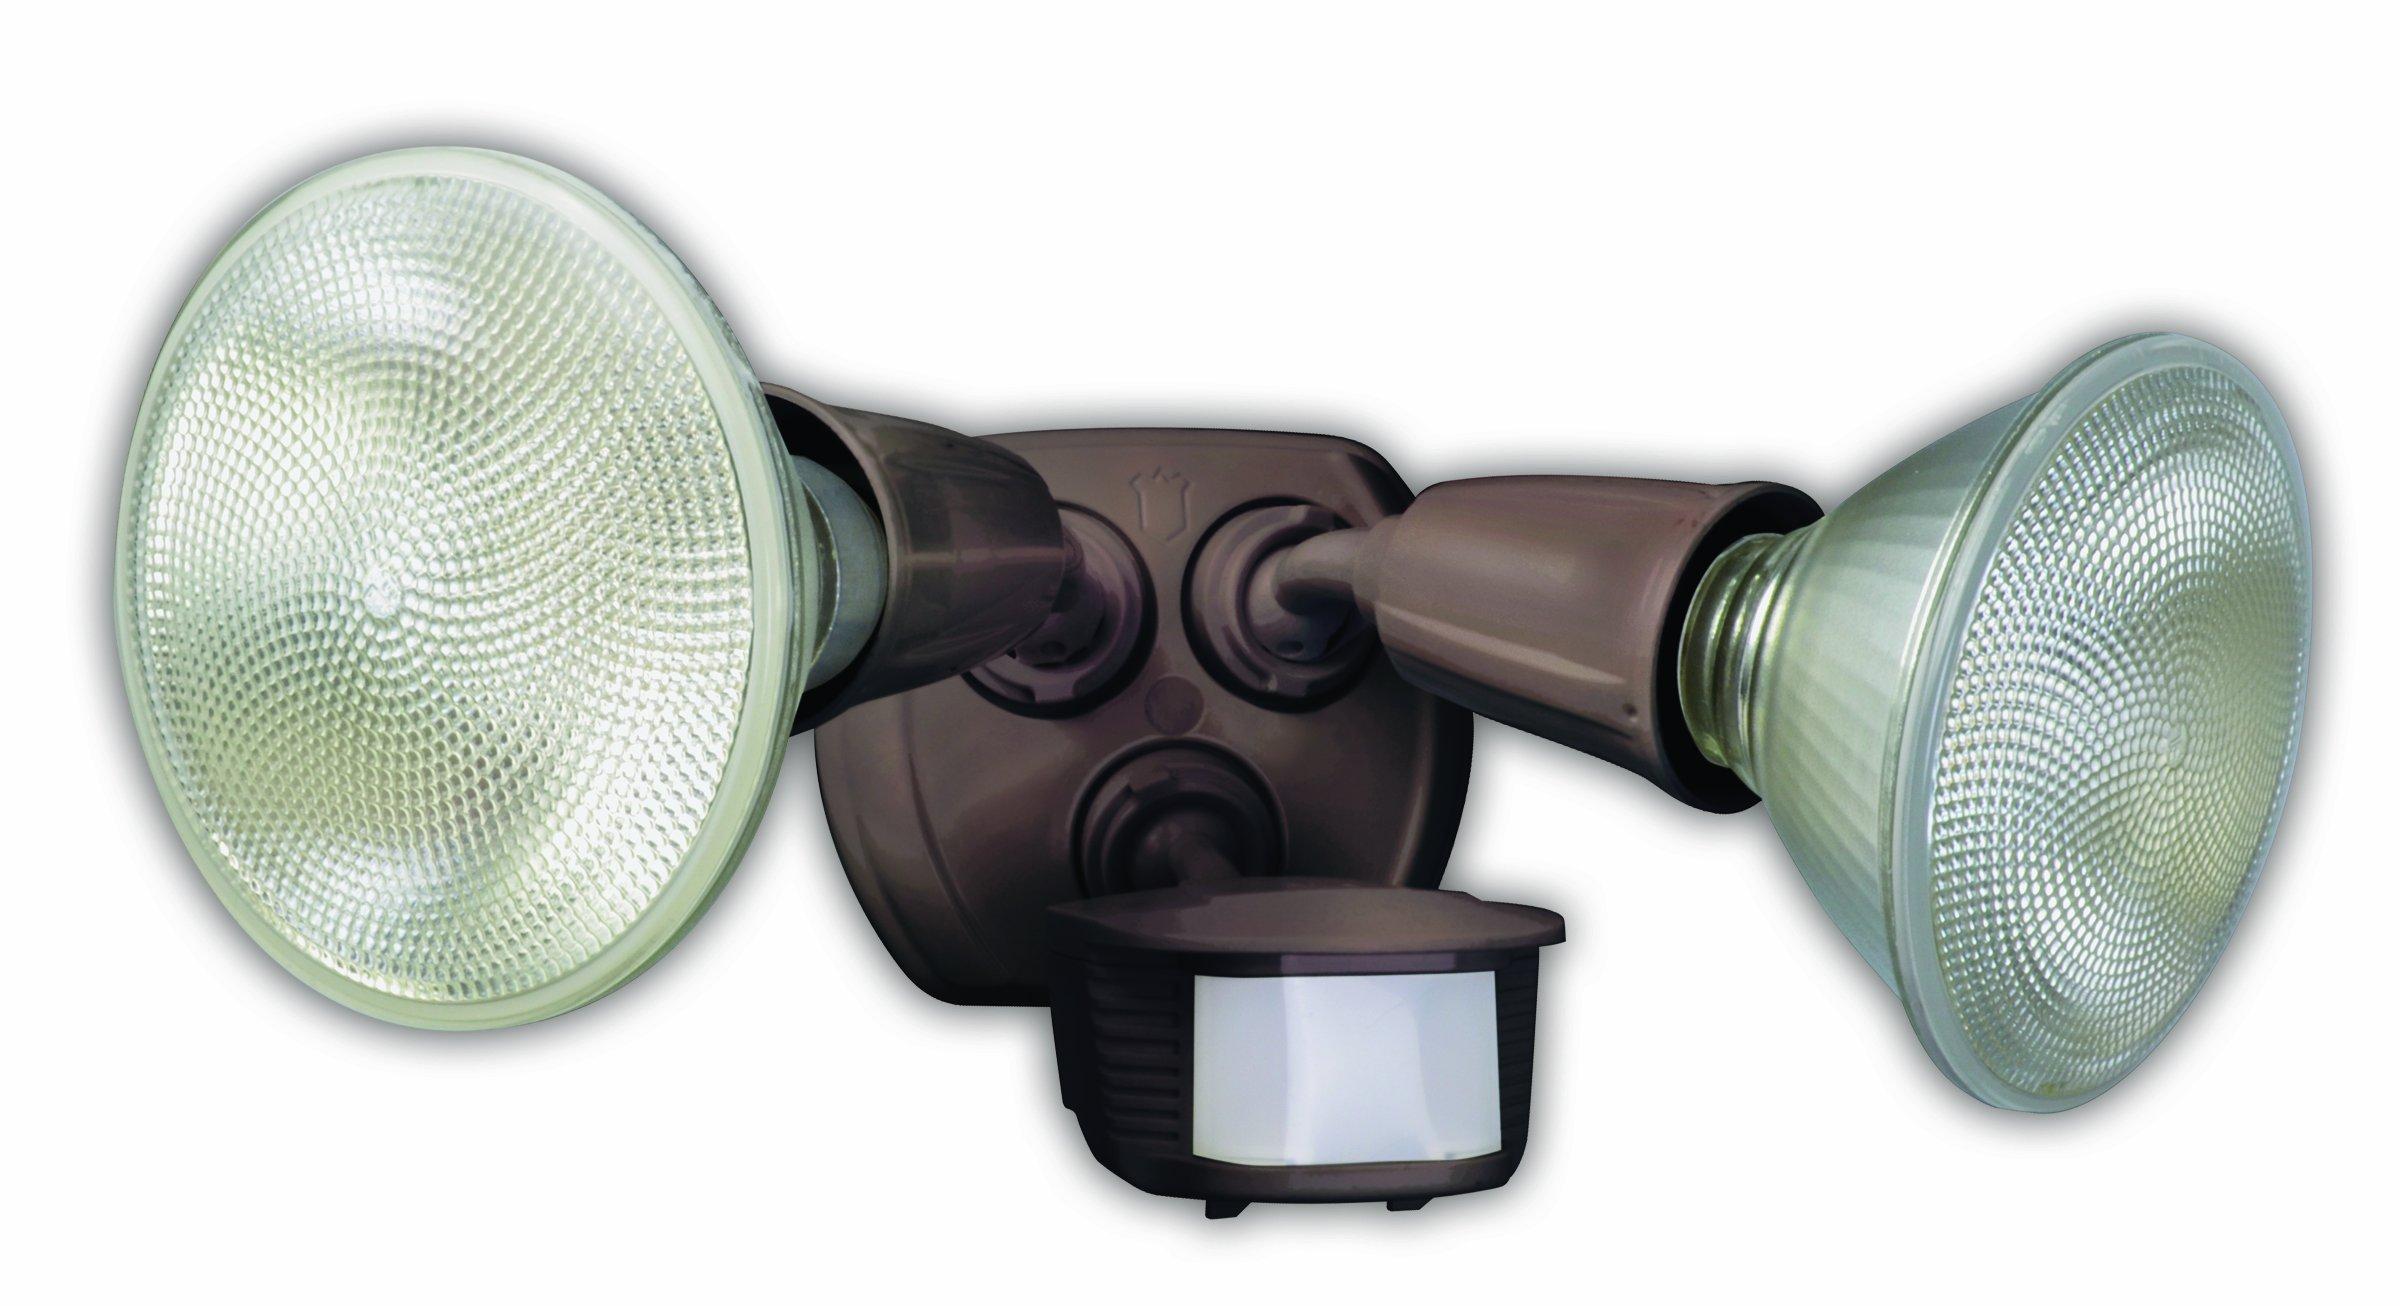 Designers Edge L6003BR 180-Degree Diecast Metal Twin Head Motion Activated Security Flood Light, Bronze, 240-watt